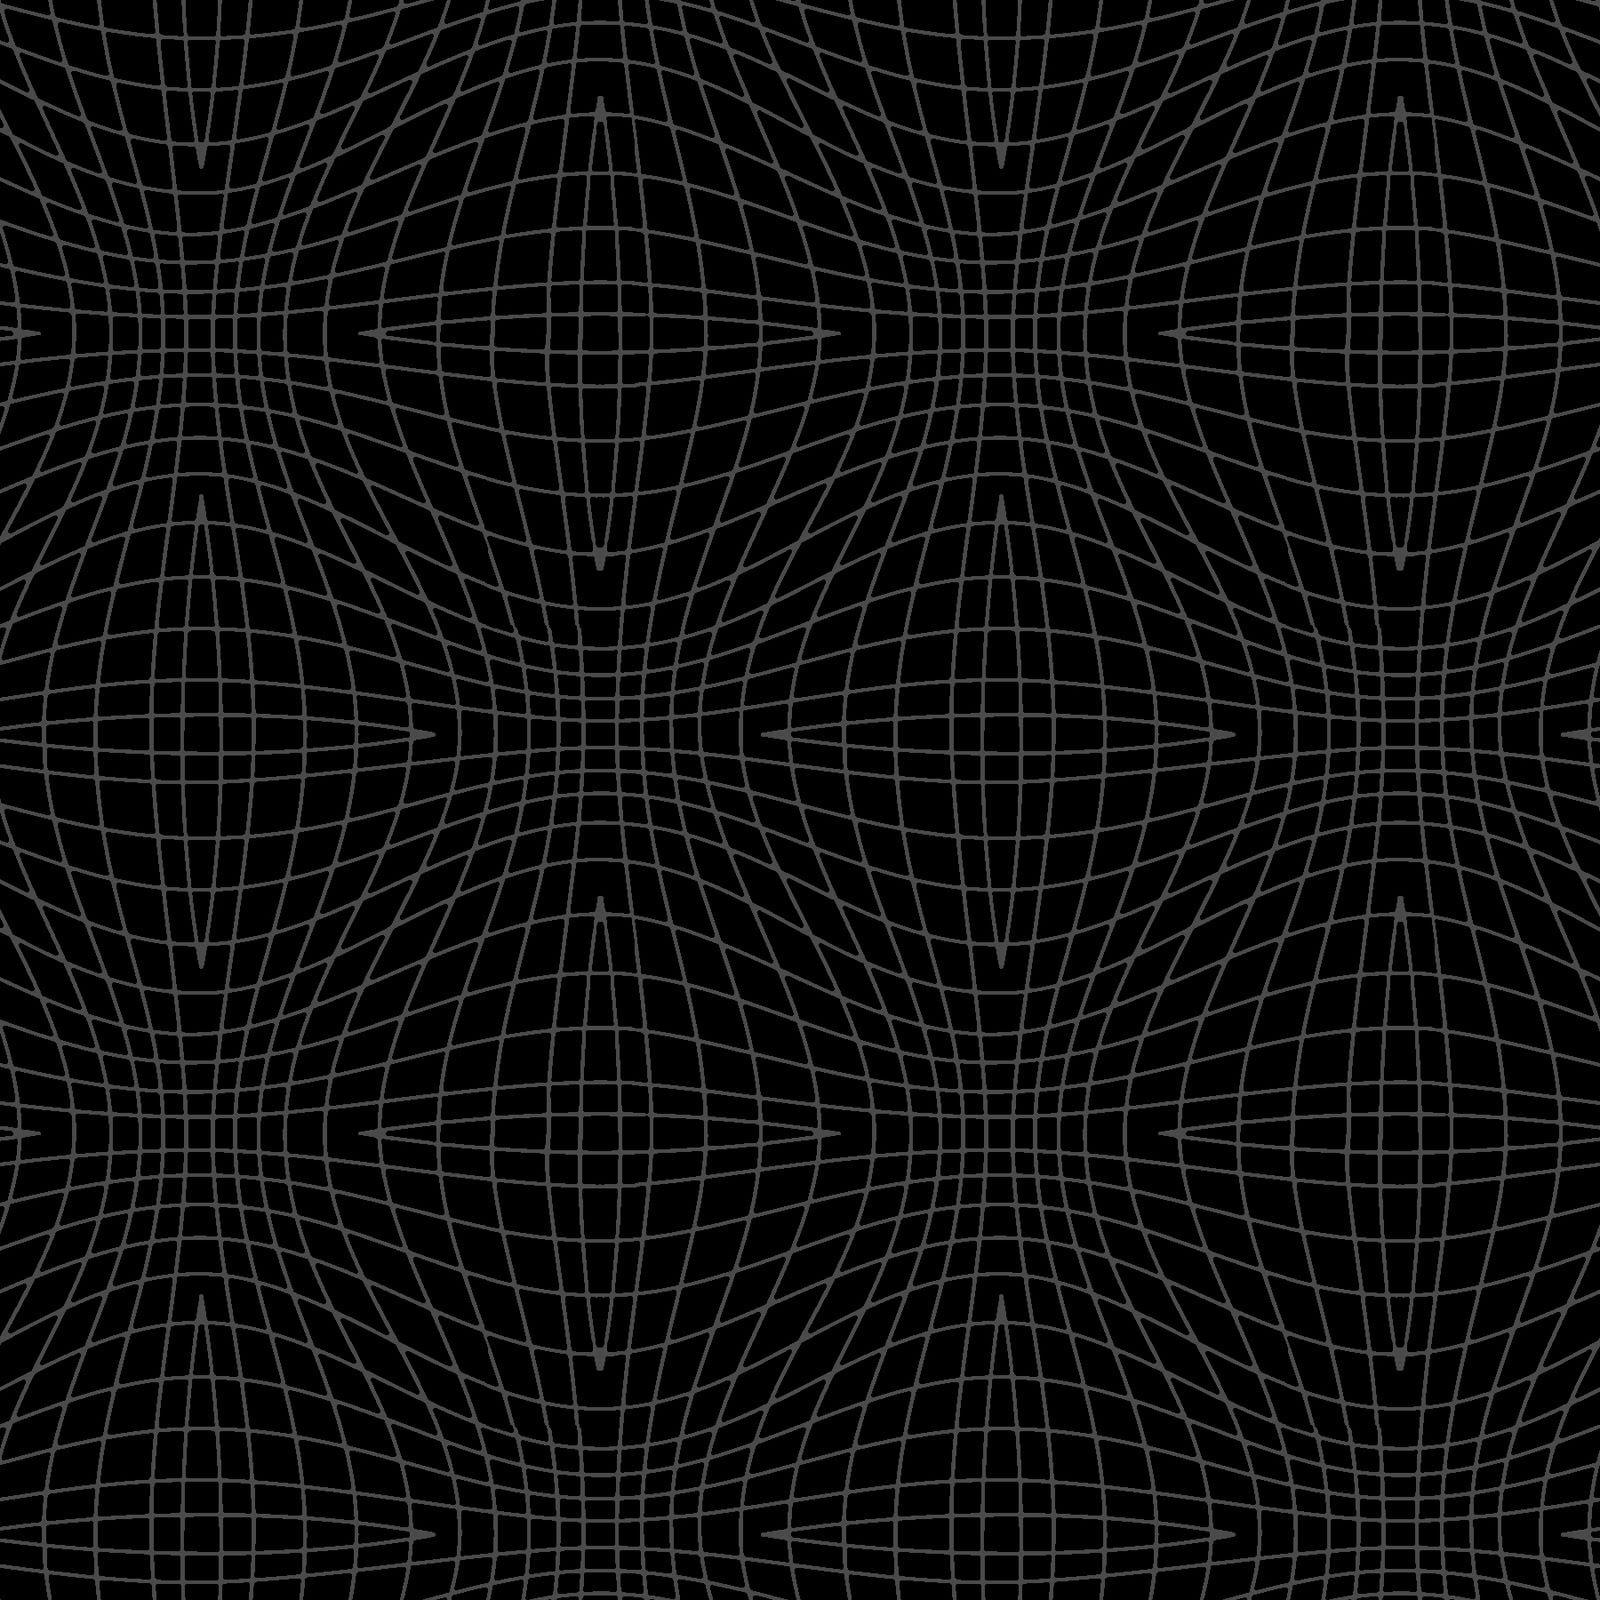 In the Black Geometric